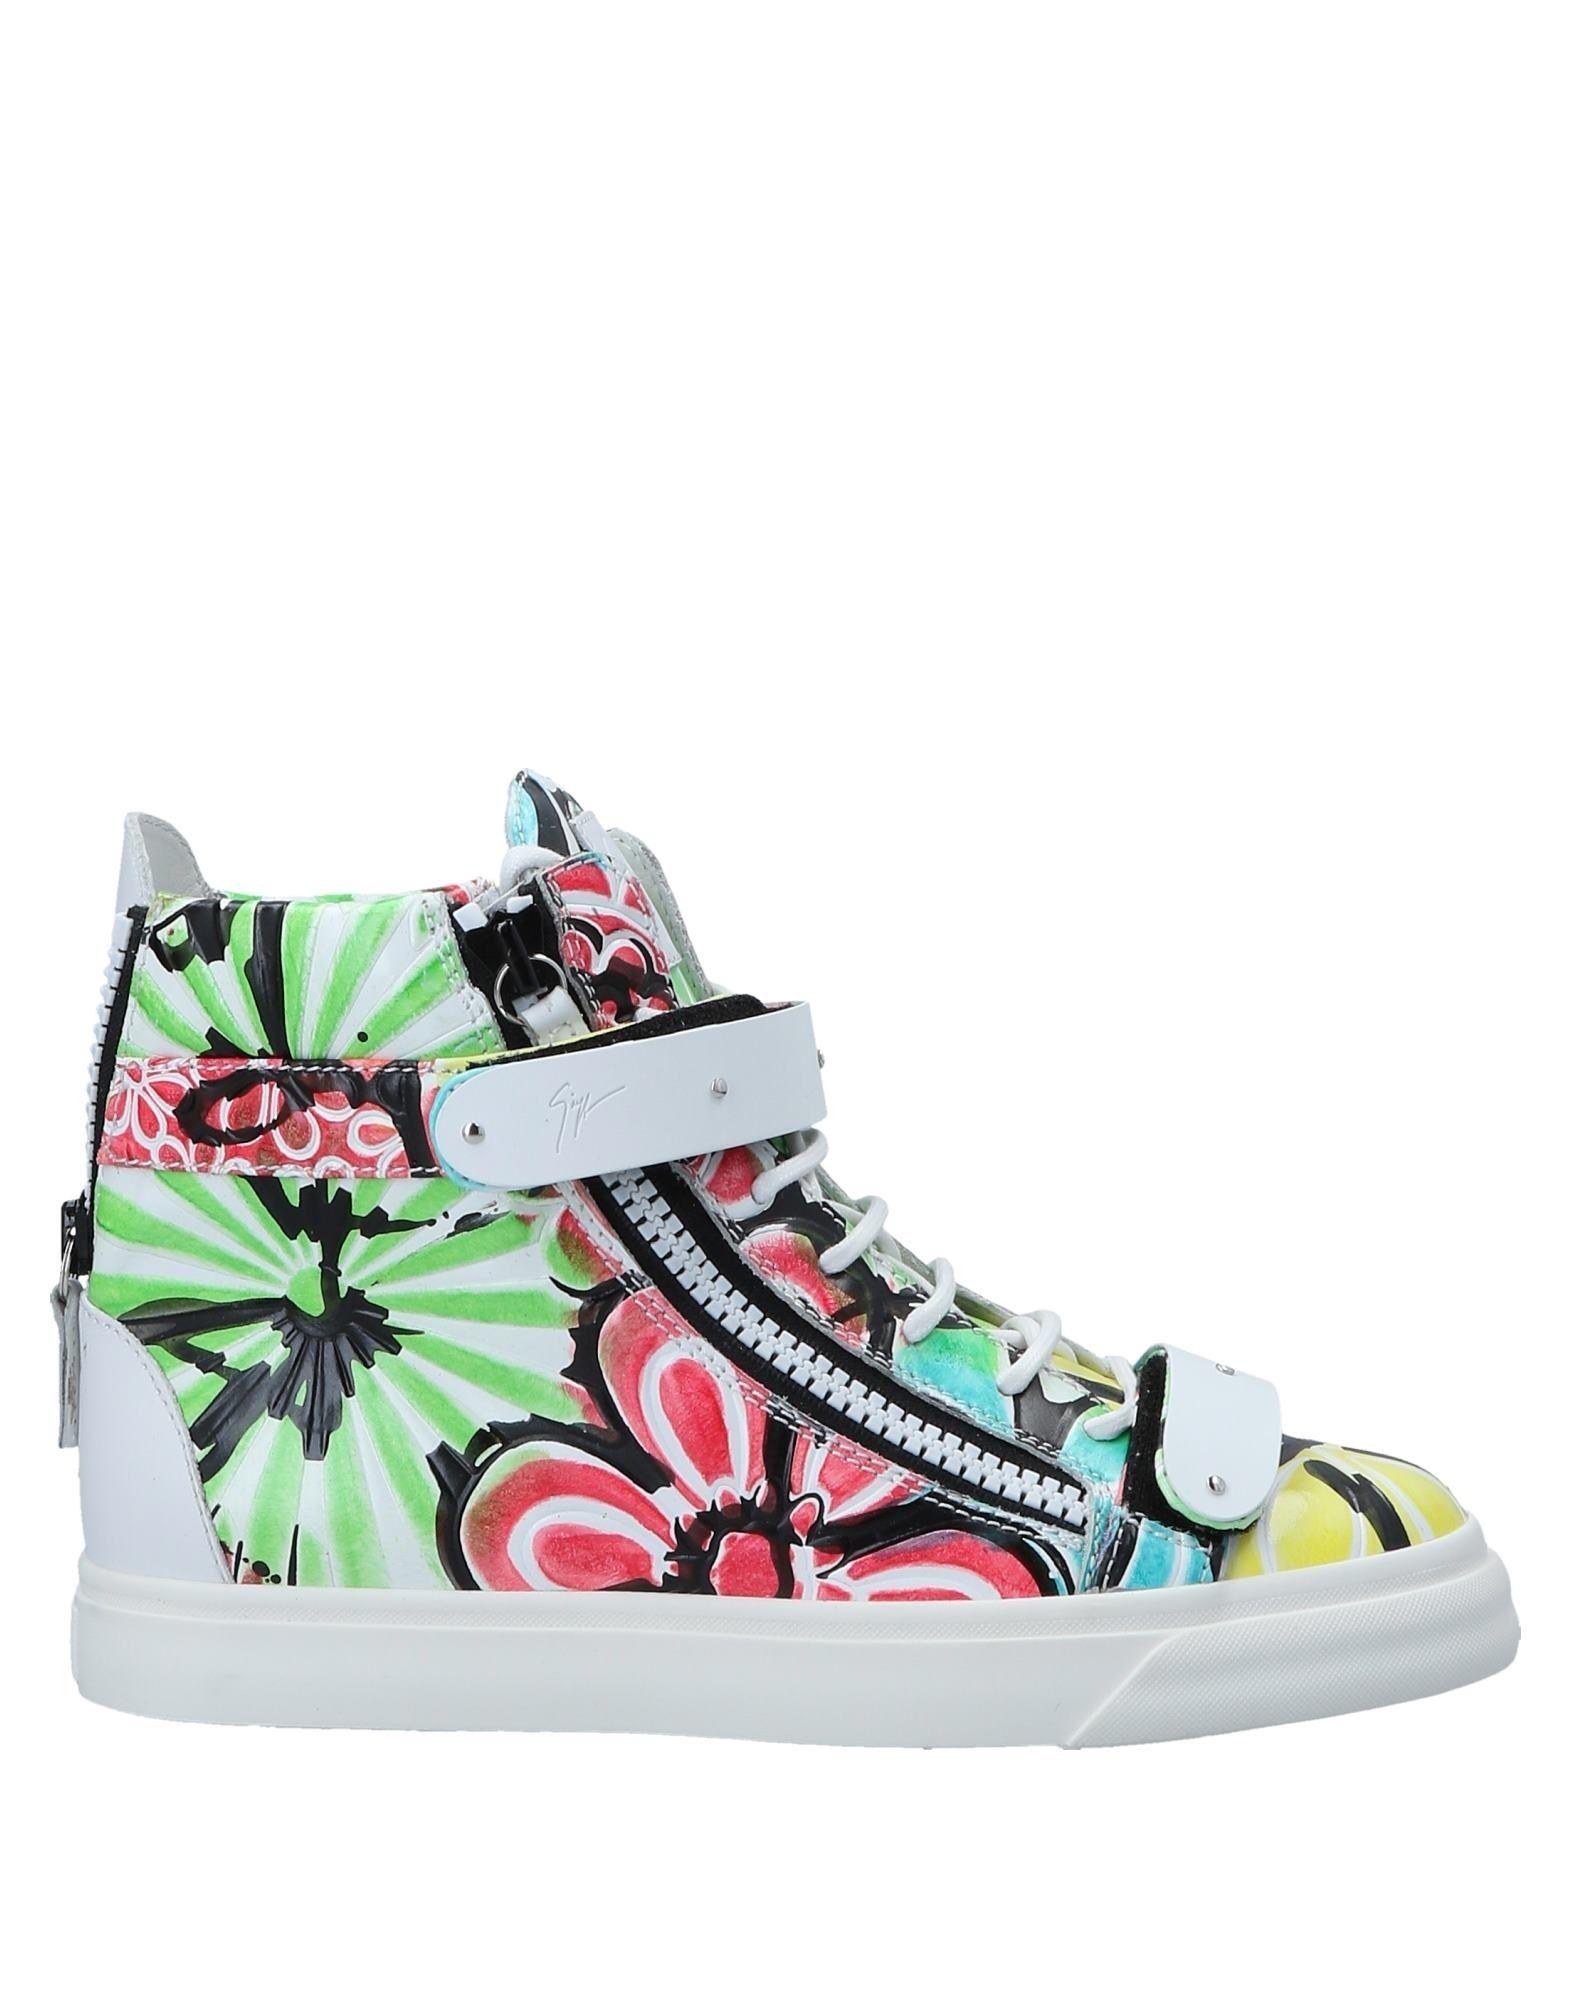 Giuseppe Zanotti Sneakers Herren  Schuhe 11555452UQ Gute Qualität beliebte Schuhe  76ed54